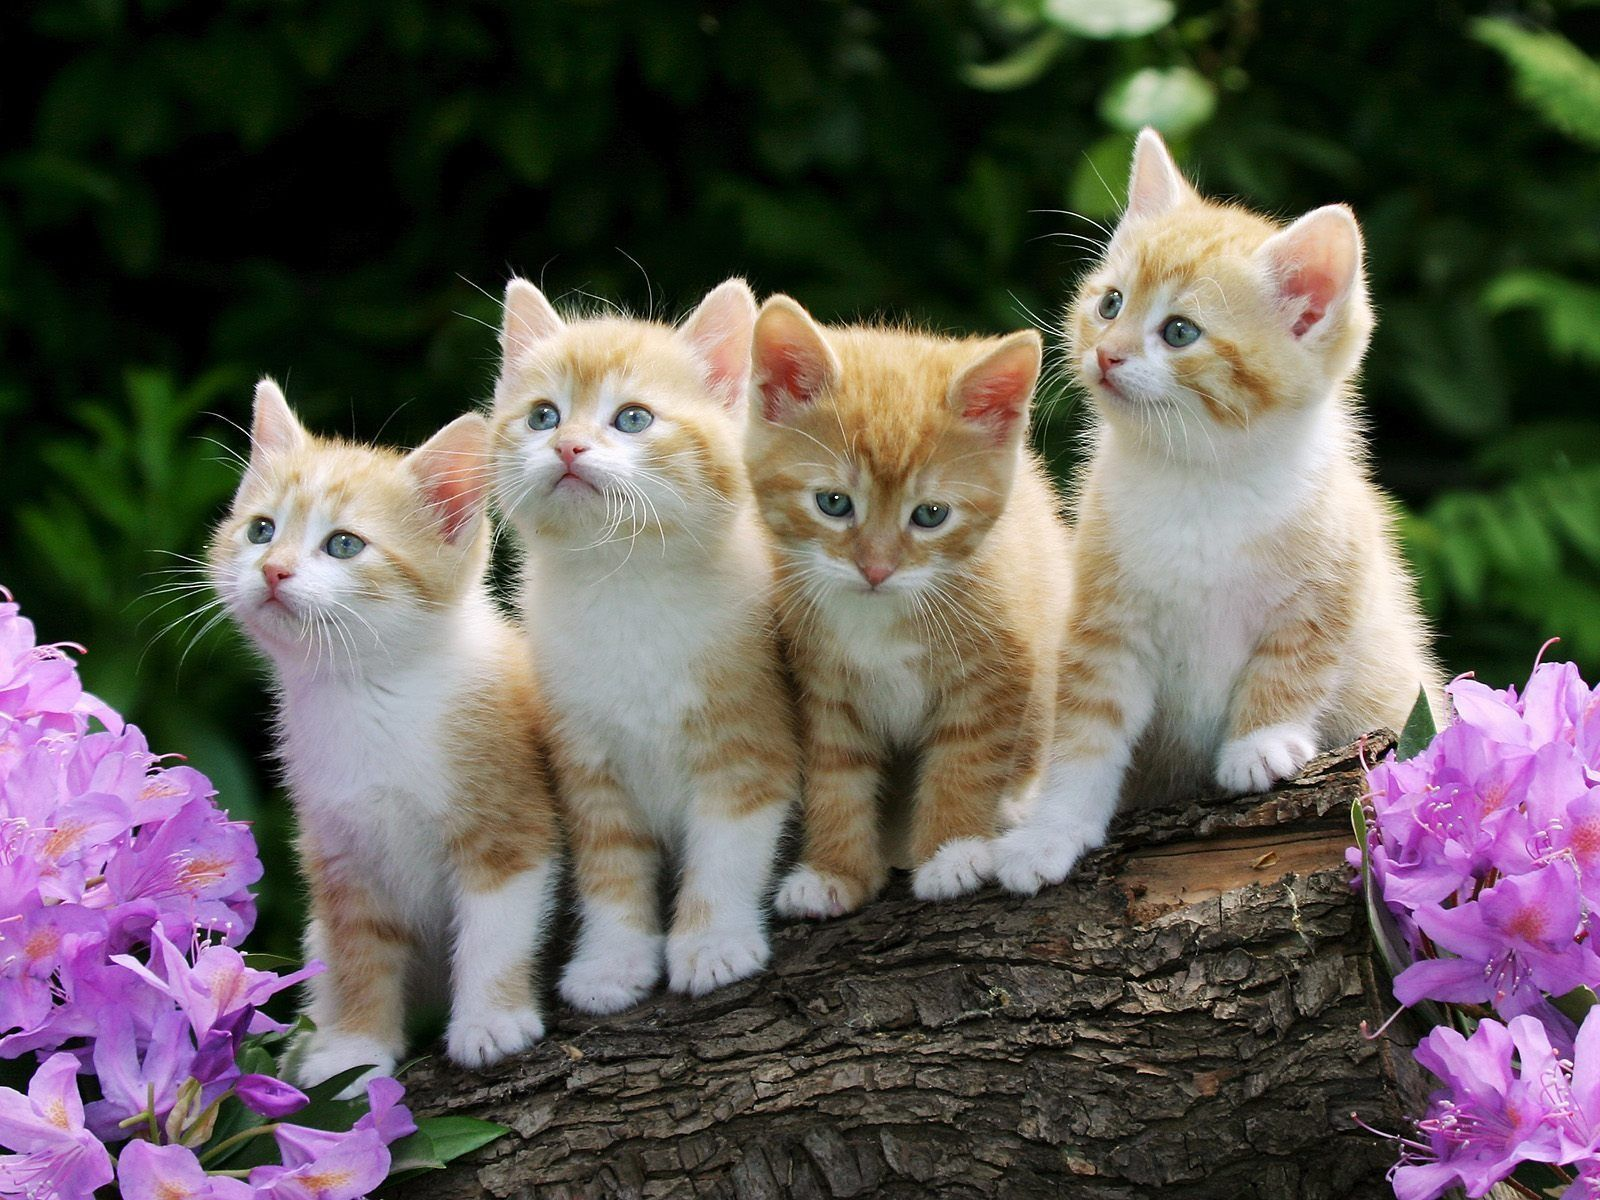 Hd wallpaper cat - Warriors Cats Backgrounds Wallpaper